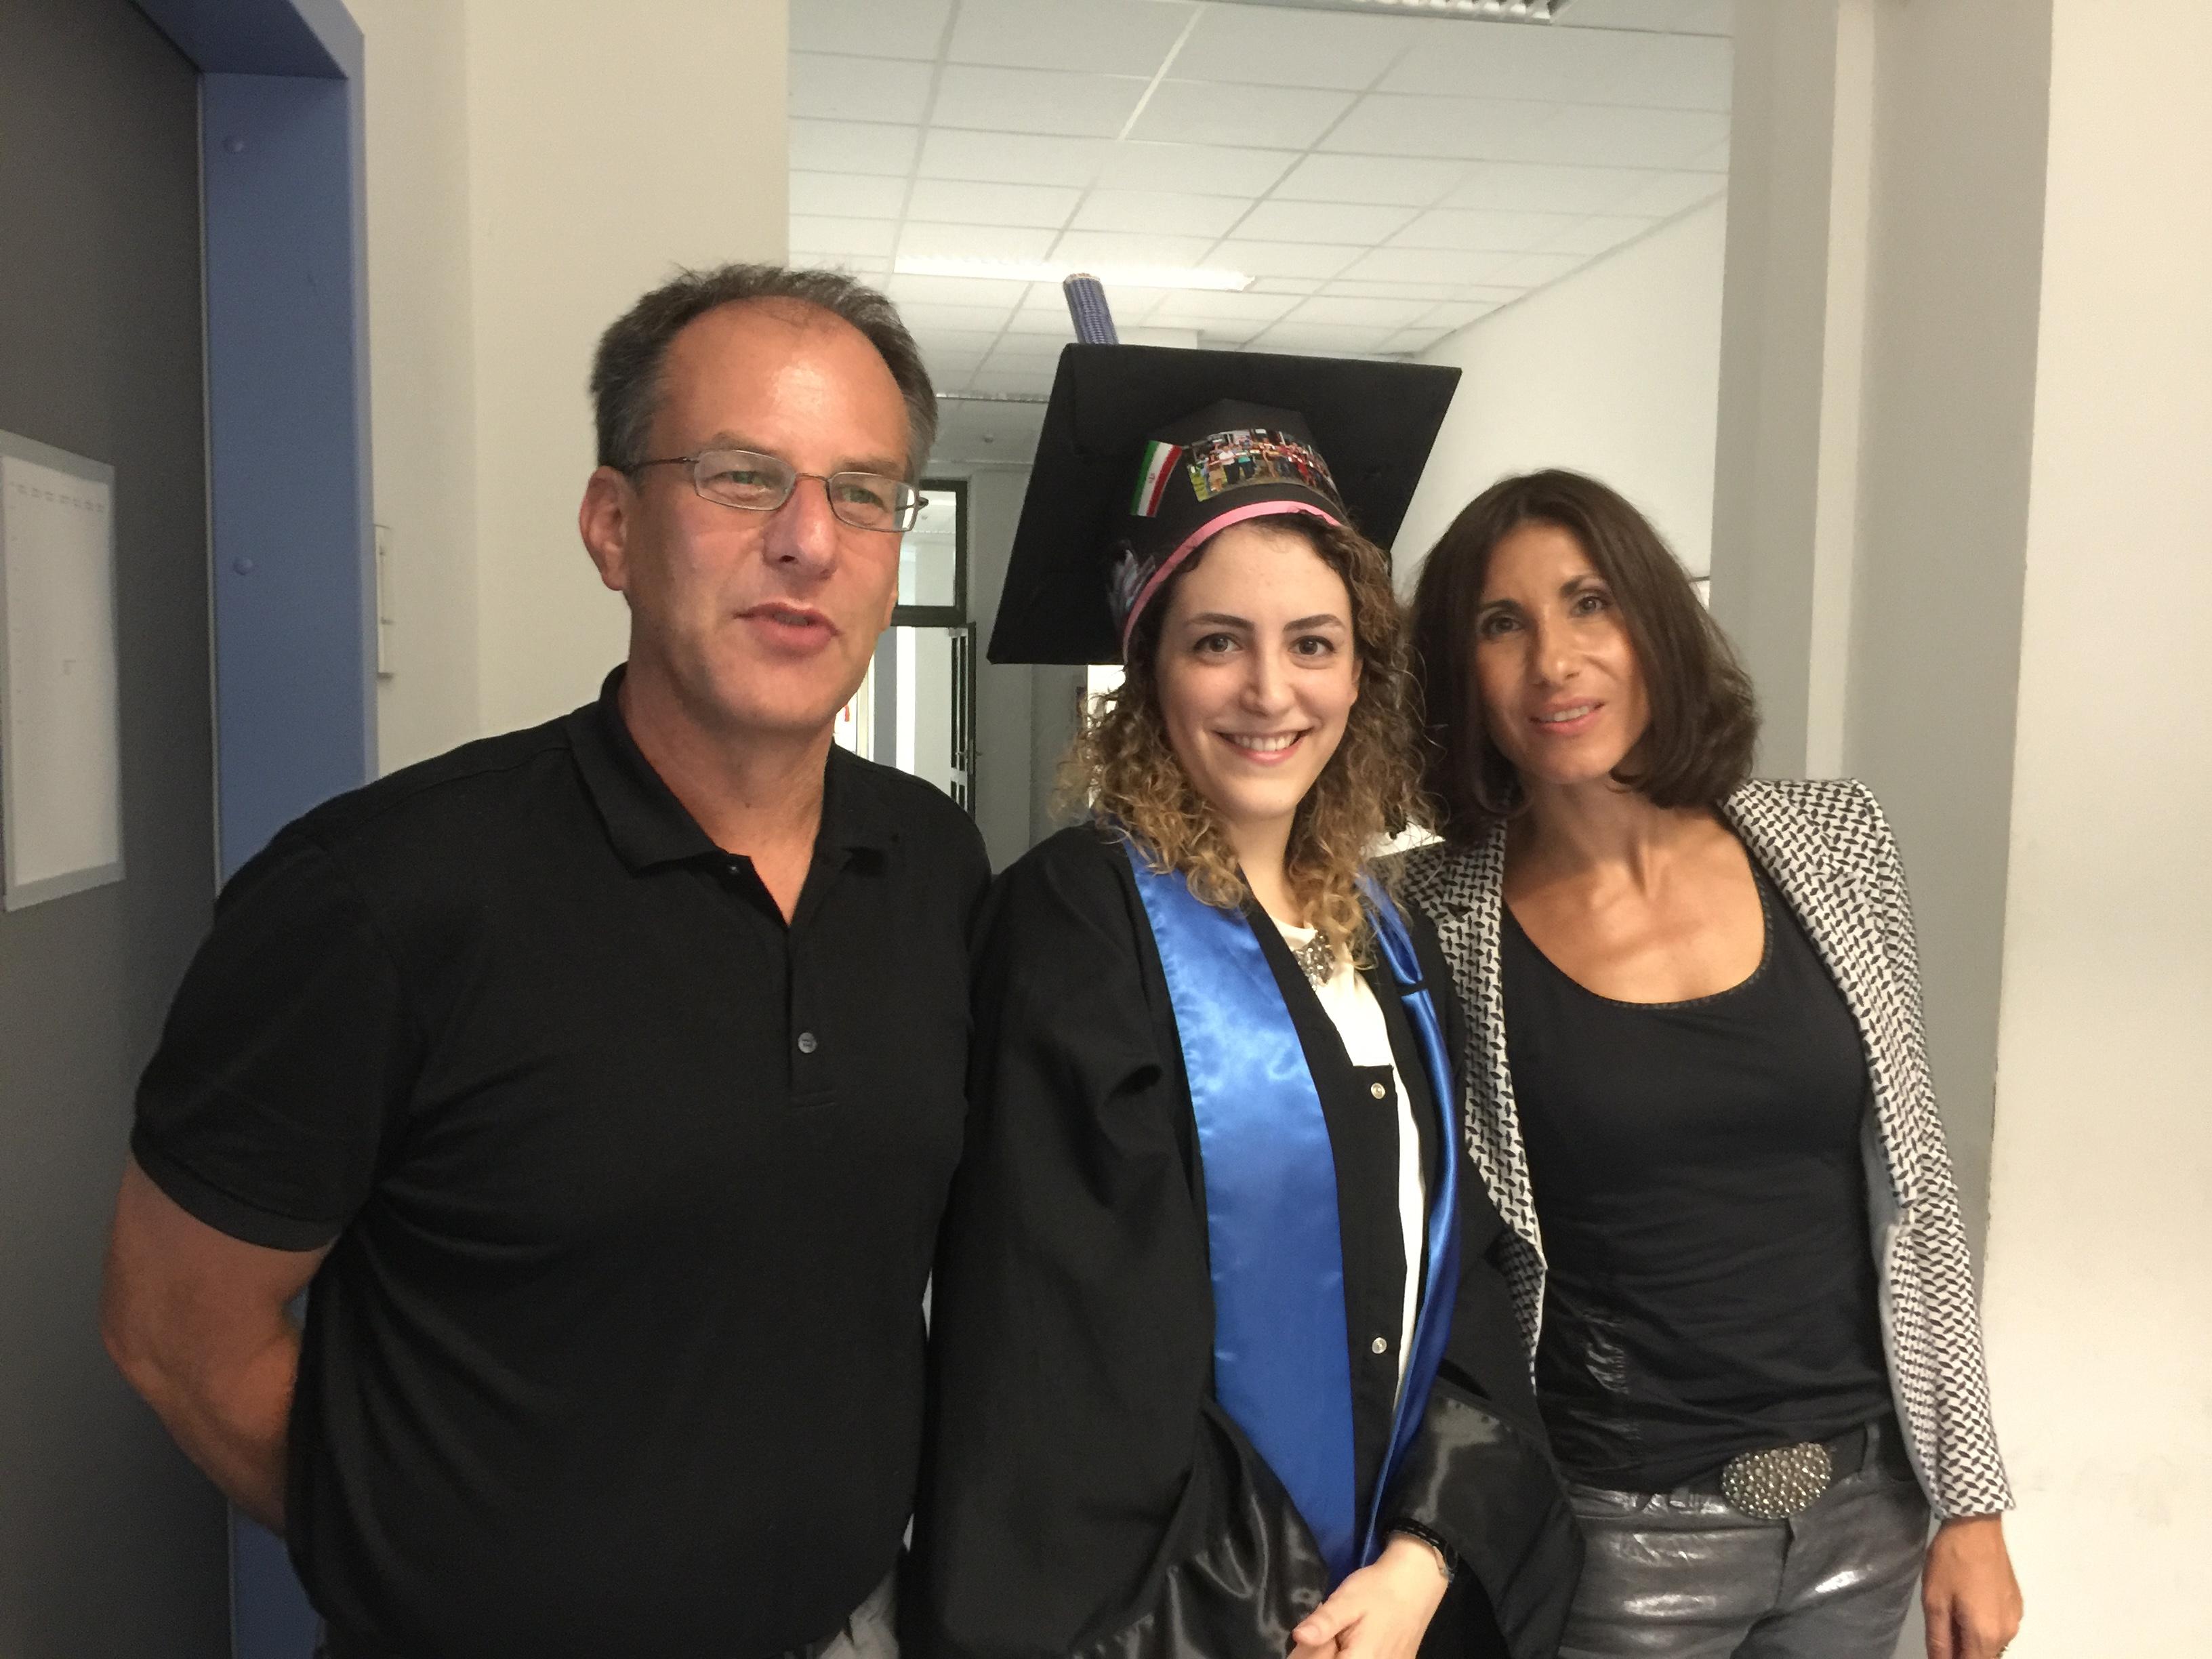 Uwe Kanter, Zahra Lofti and Katja Rost